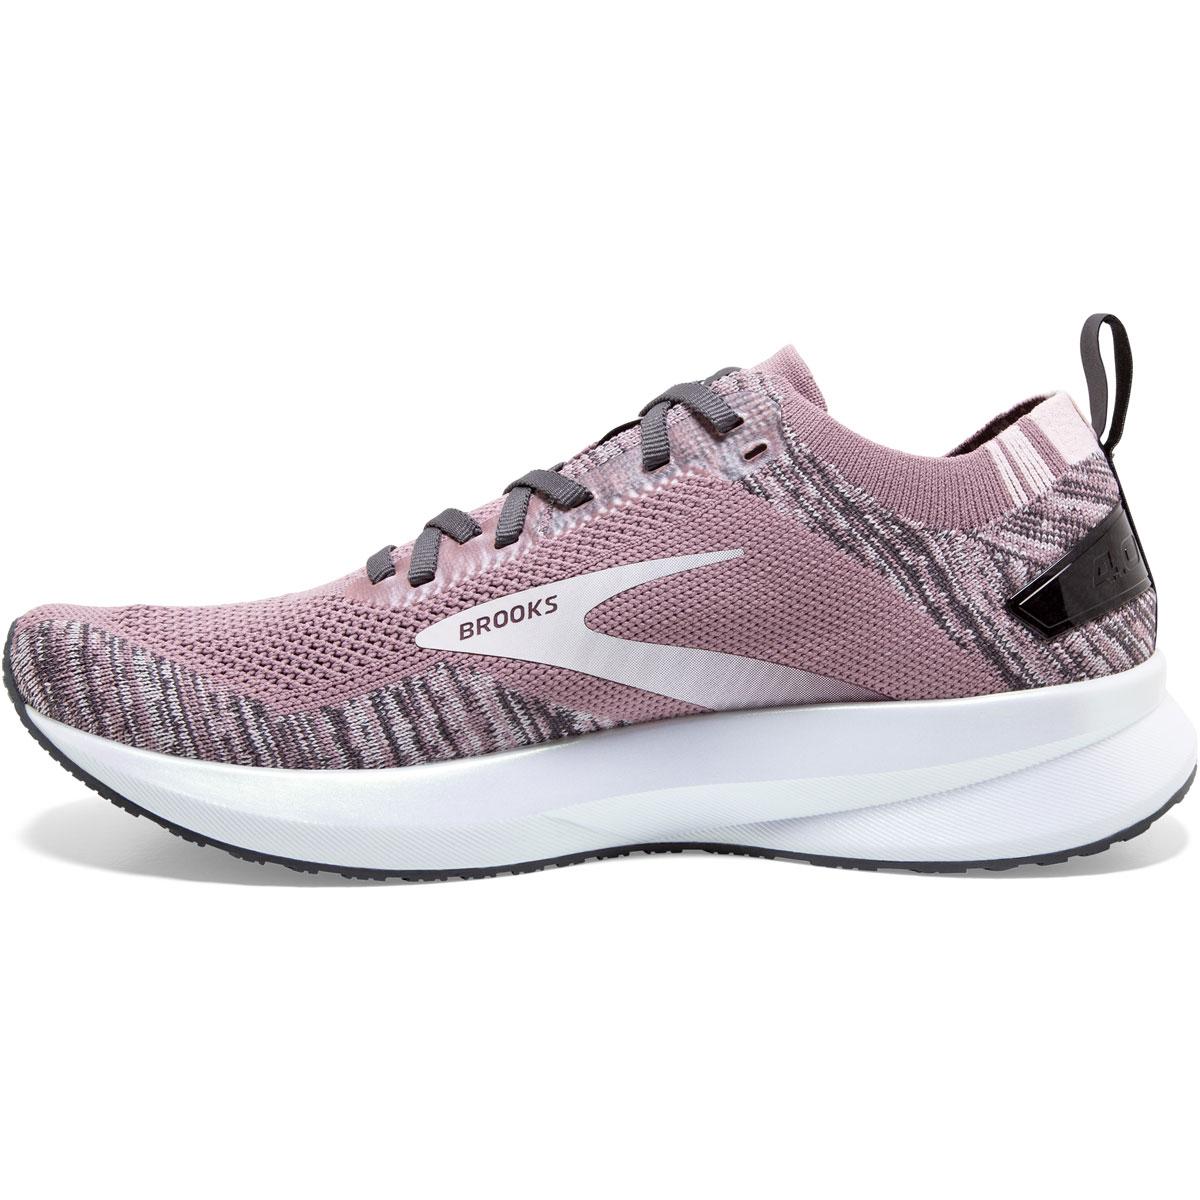 Women's Brooks Levitate 4 Running Shoe - Color: Blackened Pearl - Size: 5.5 - Width: Regular, Blackened Pearl, large, image 2